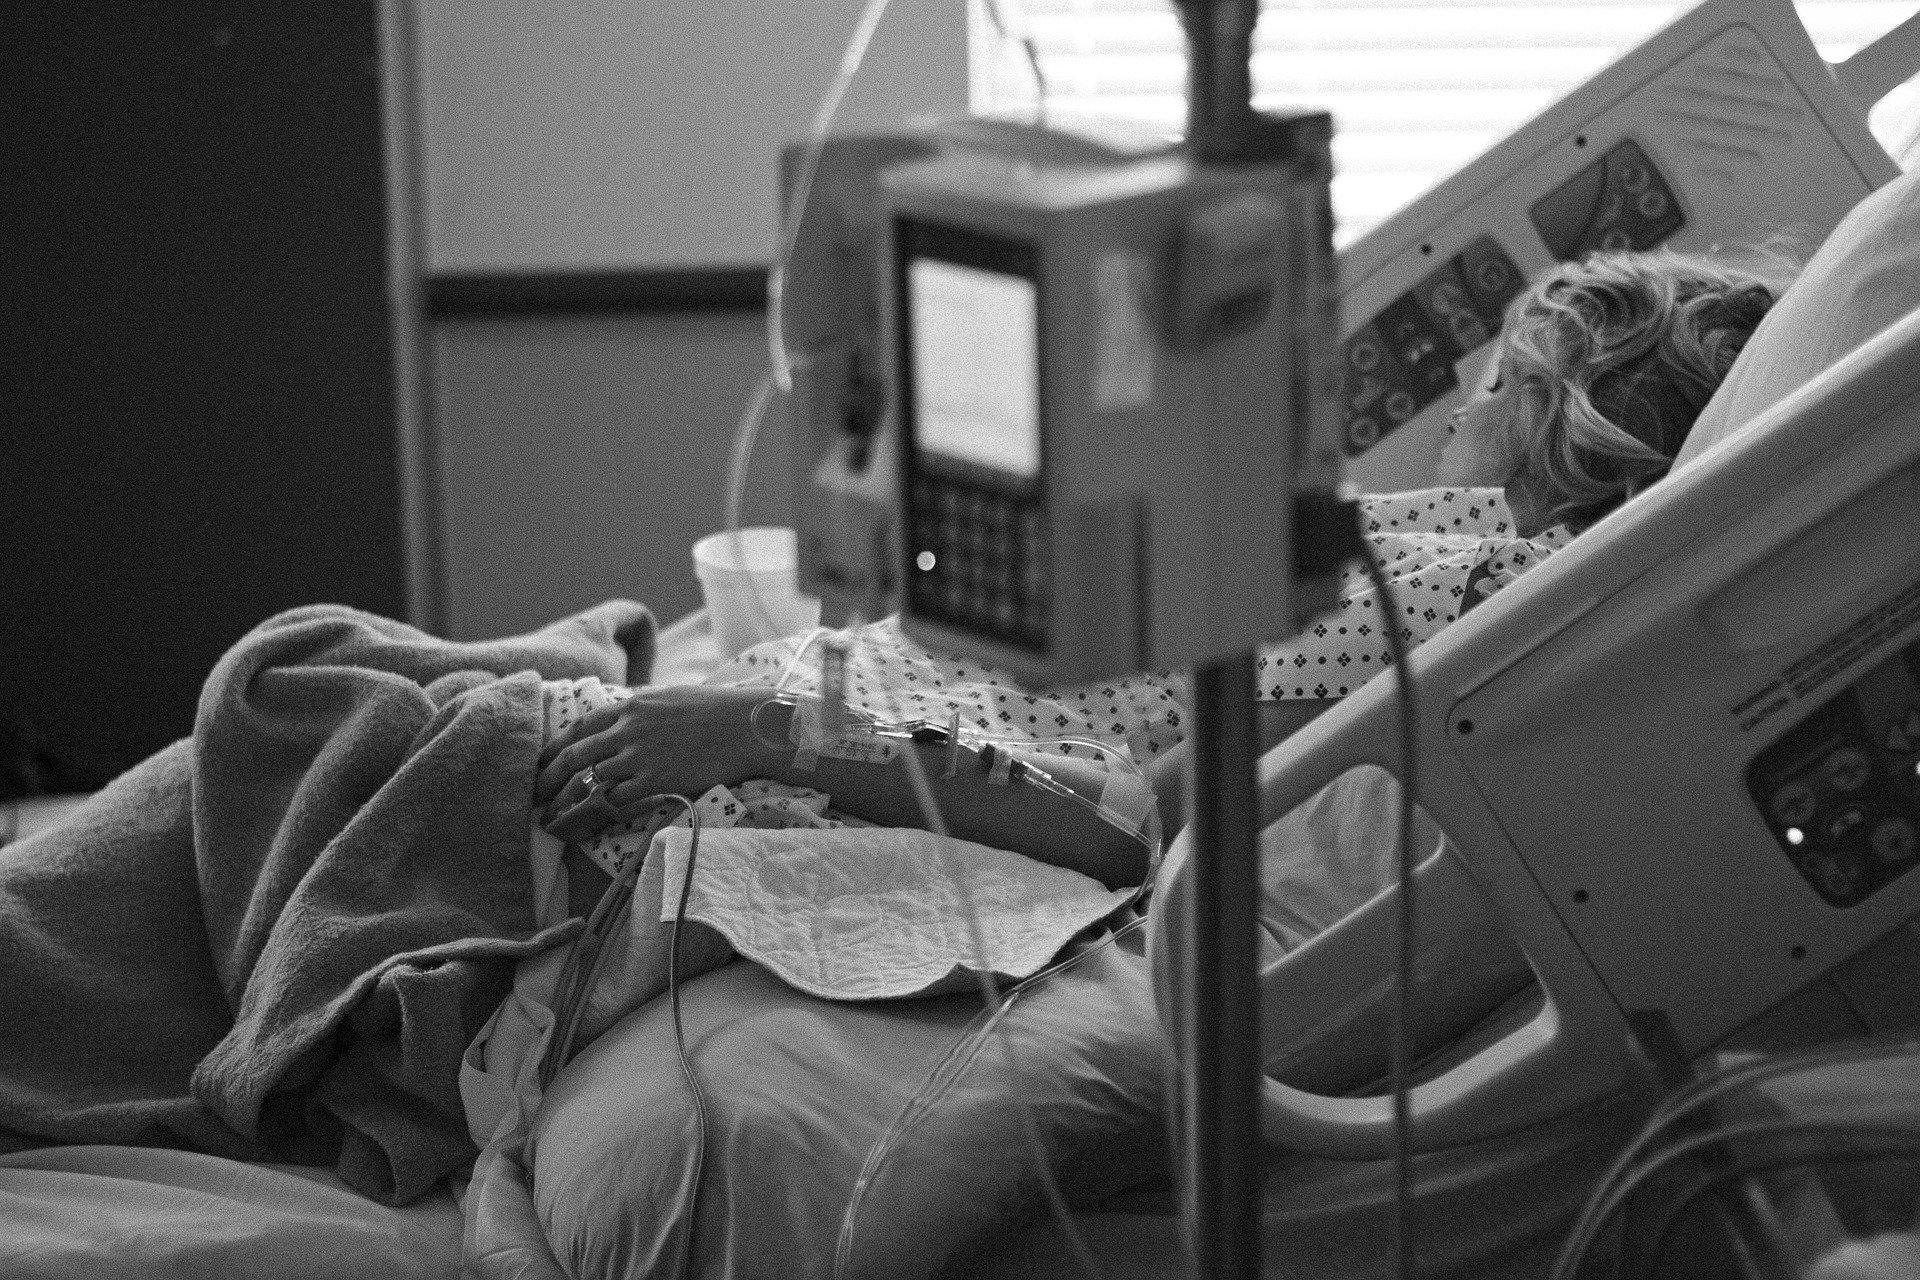 intensive care negligence